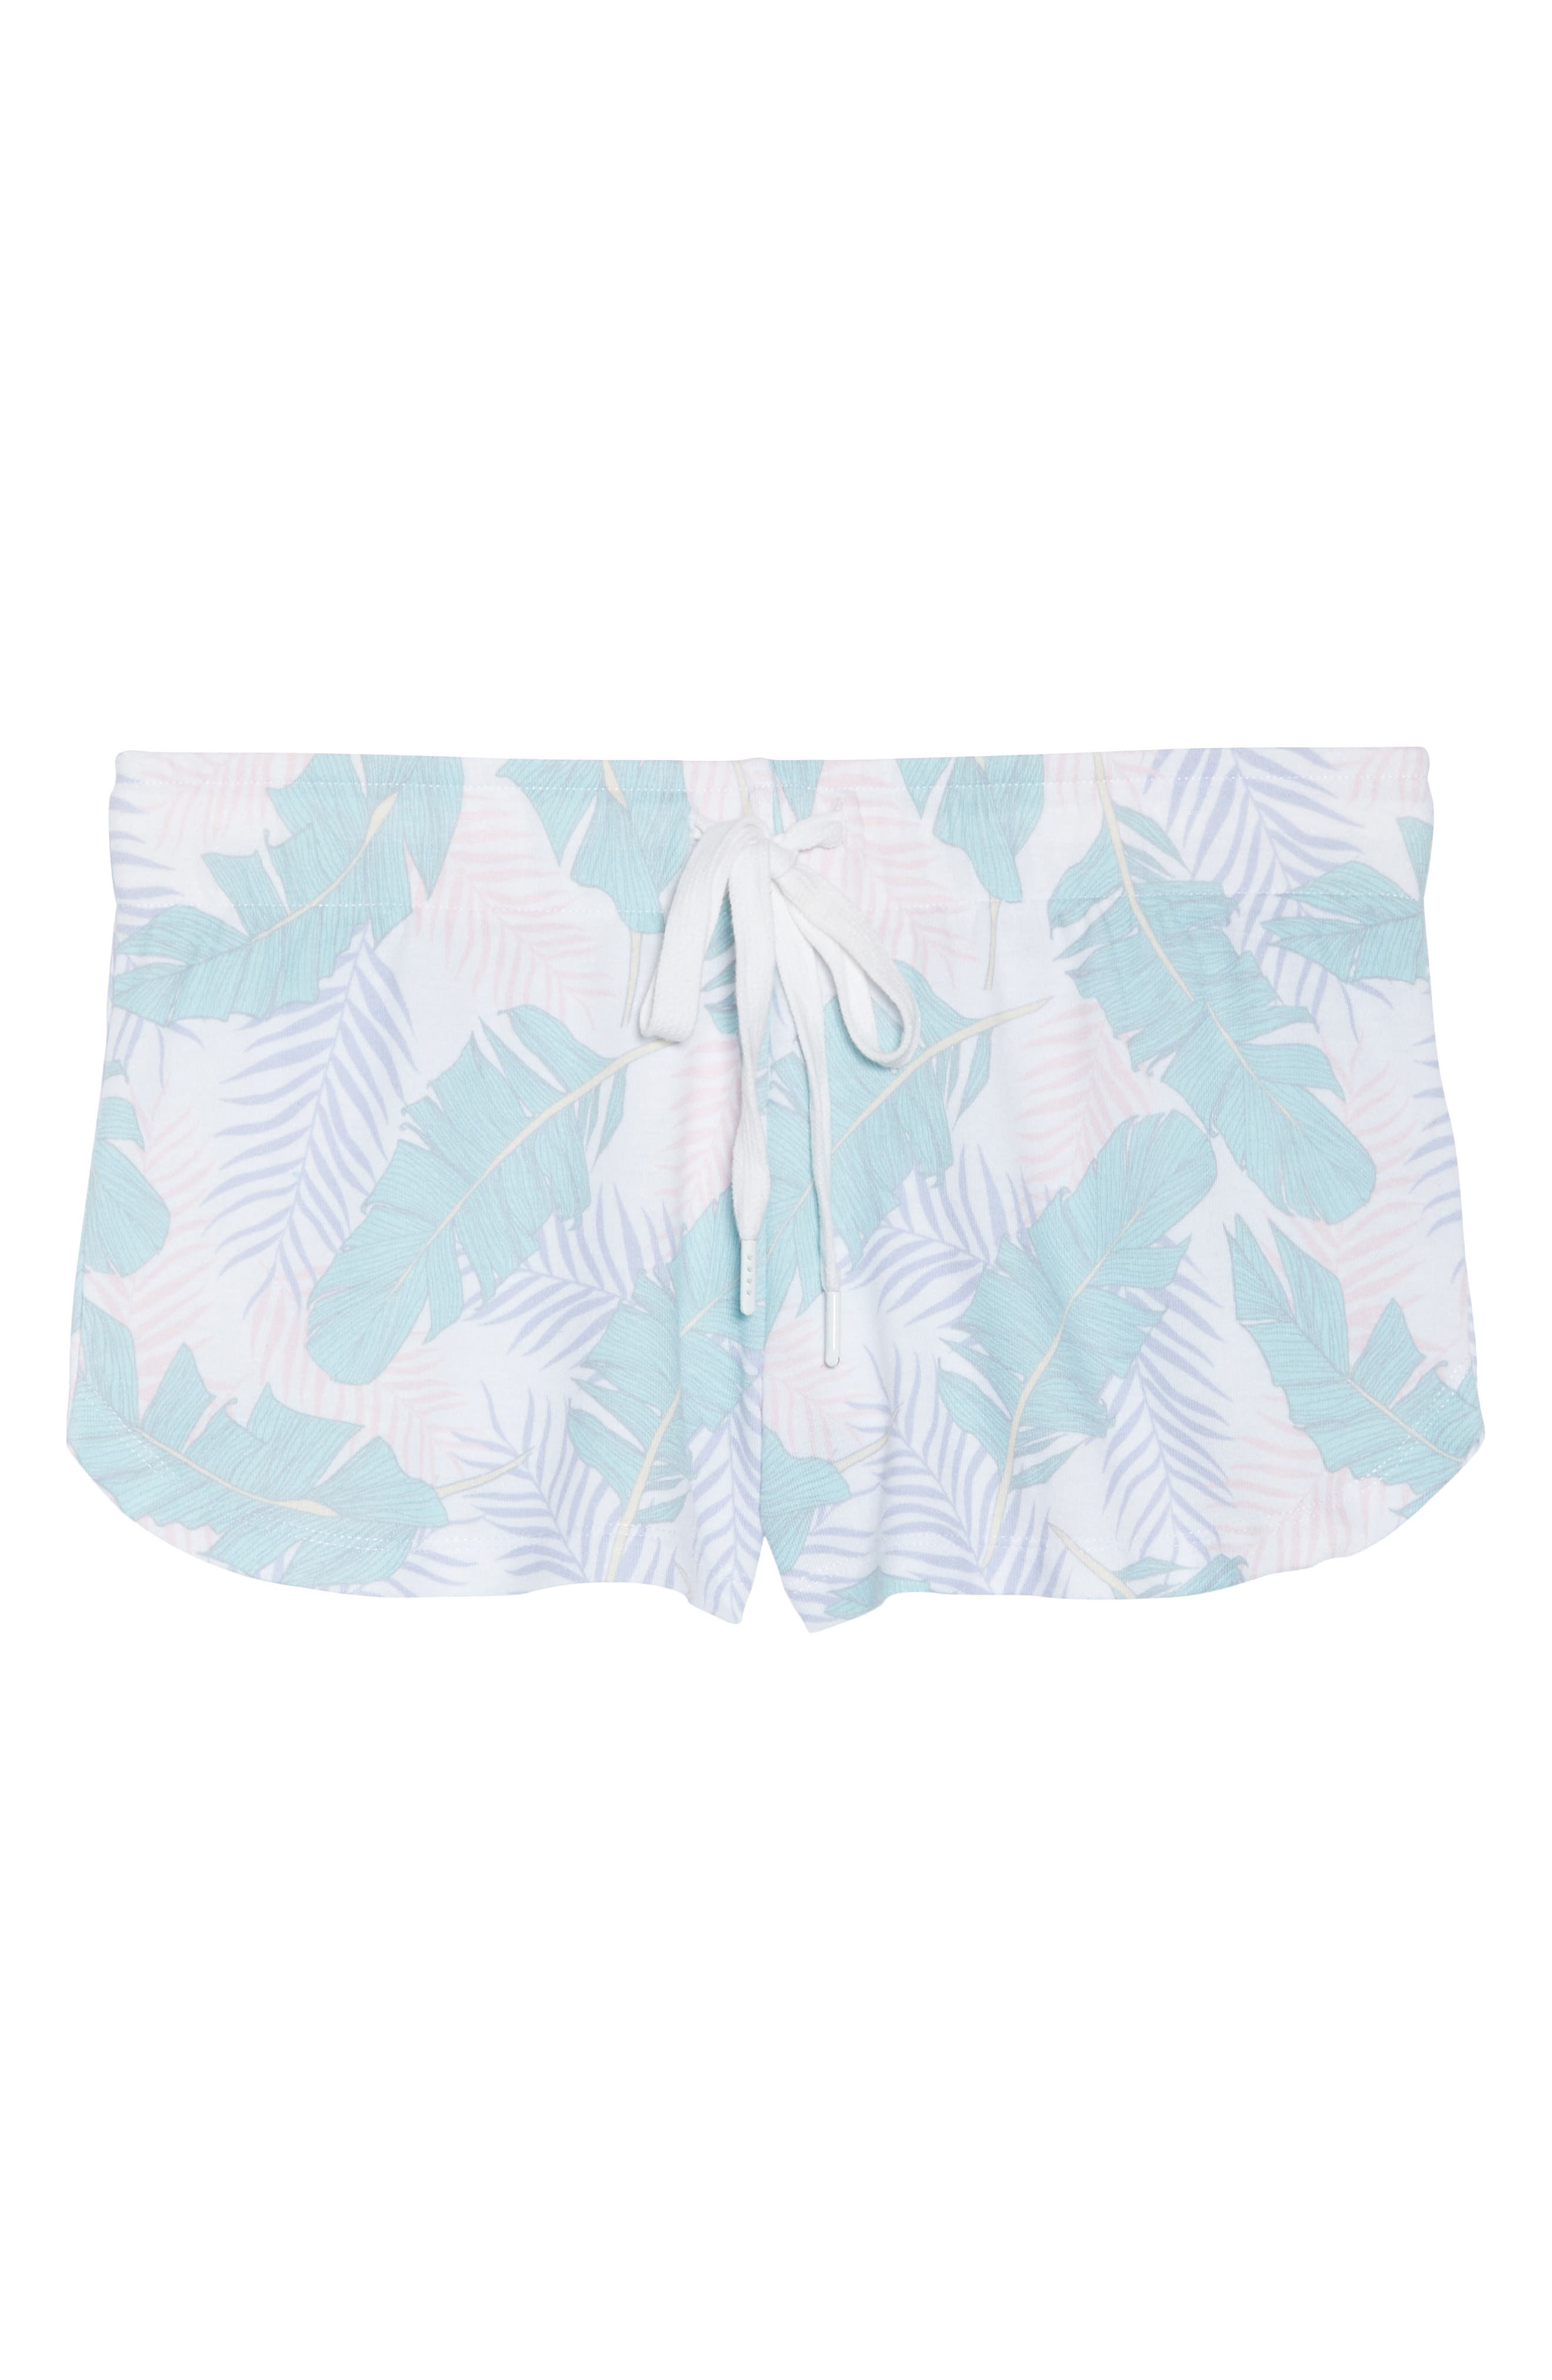 Lounge Shorts,                             Alternate thumbnail 6, color,                             100